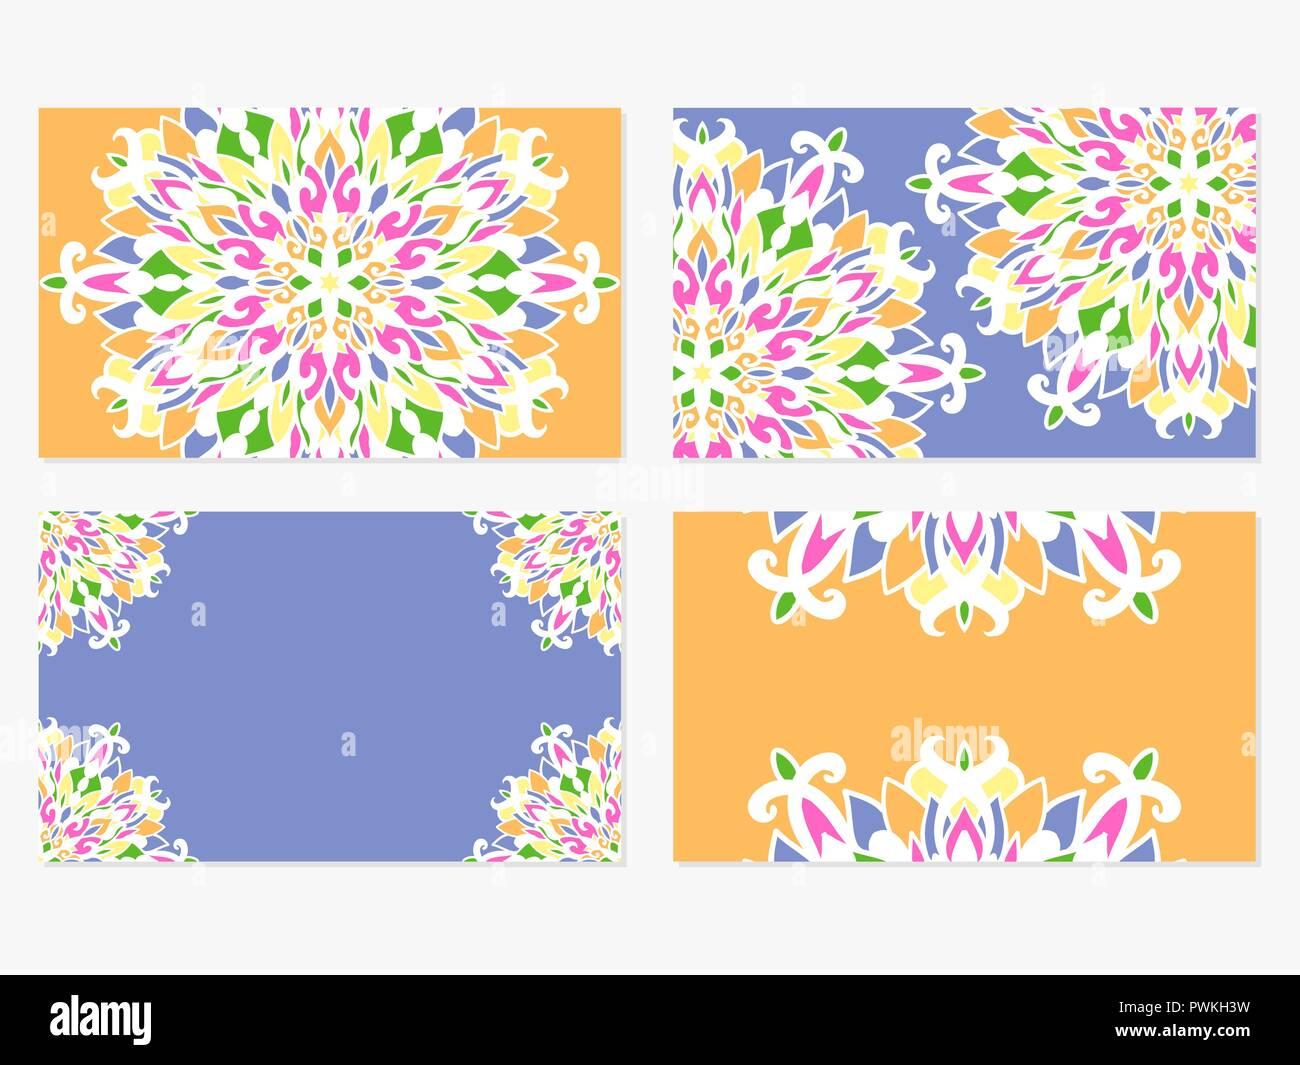 Card Templates | Satz 4 Vector Business Card Templates Schone Bunte Mandala Designs